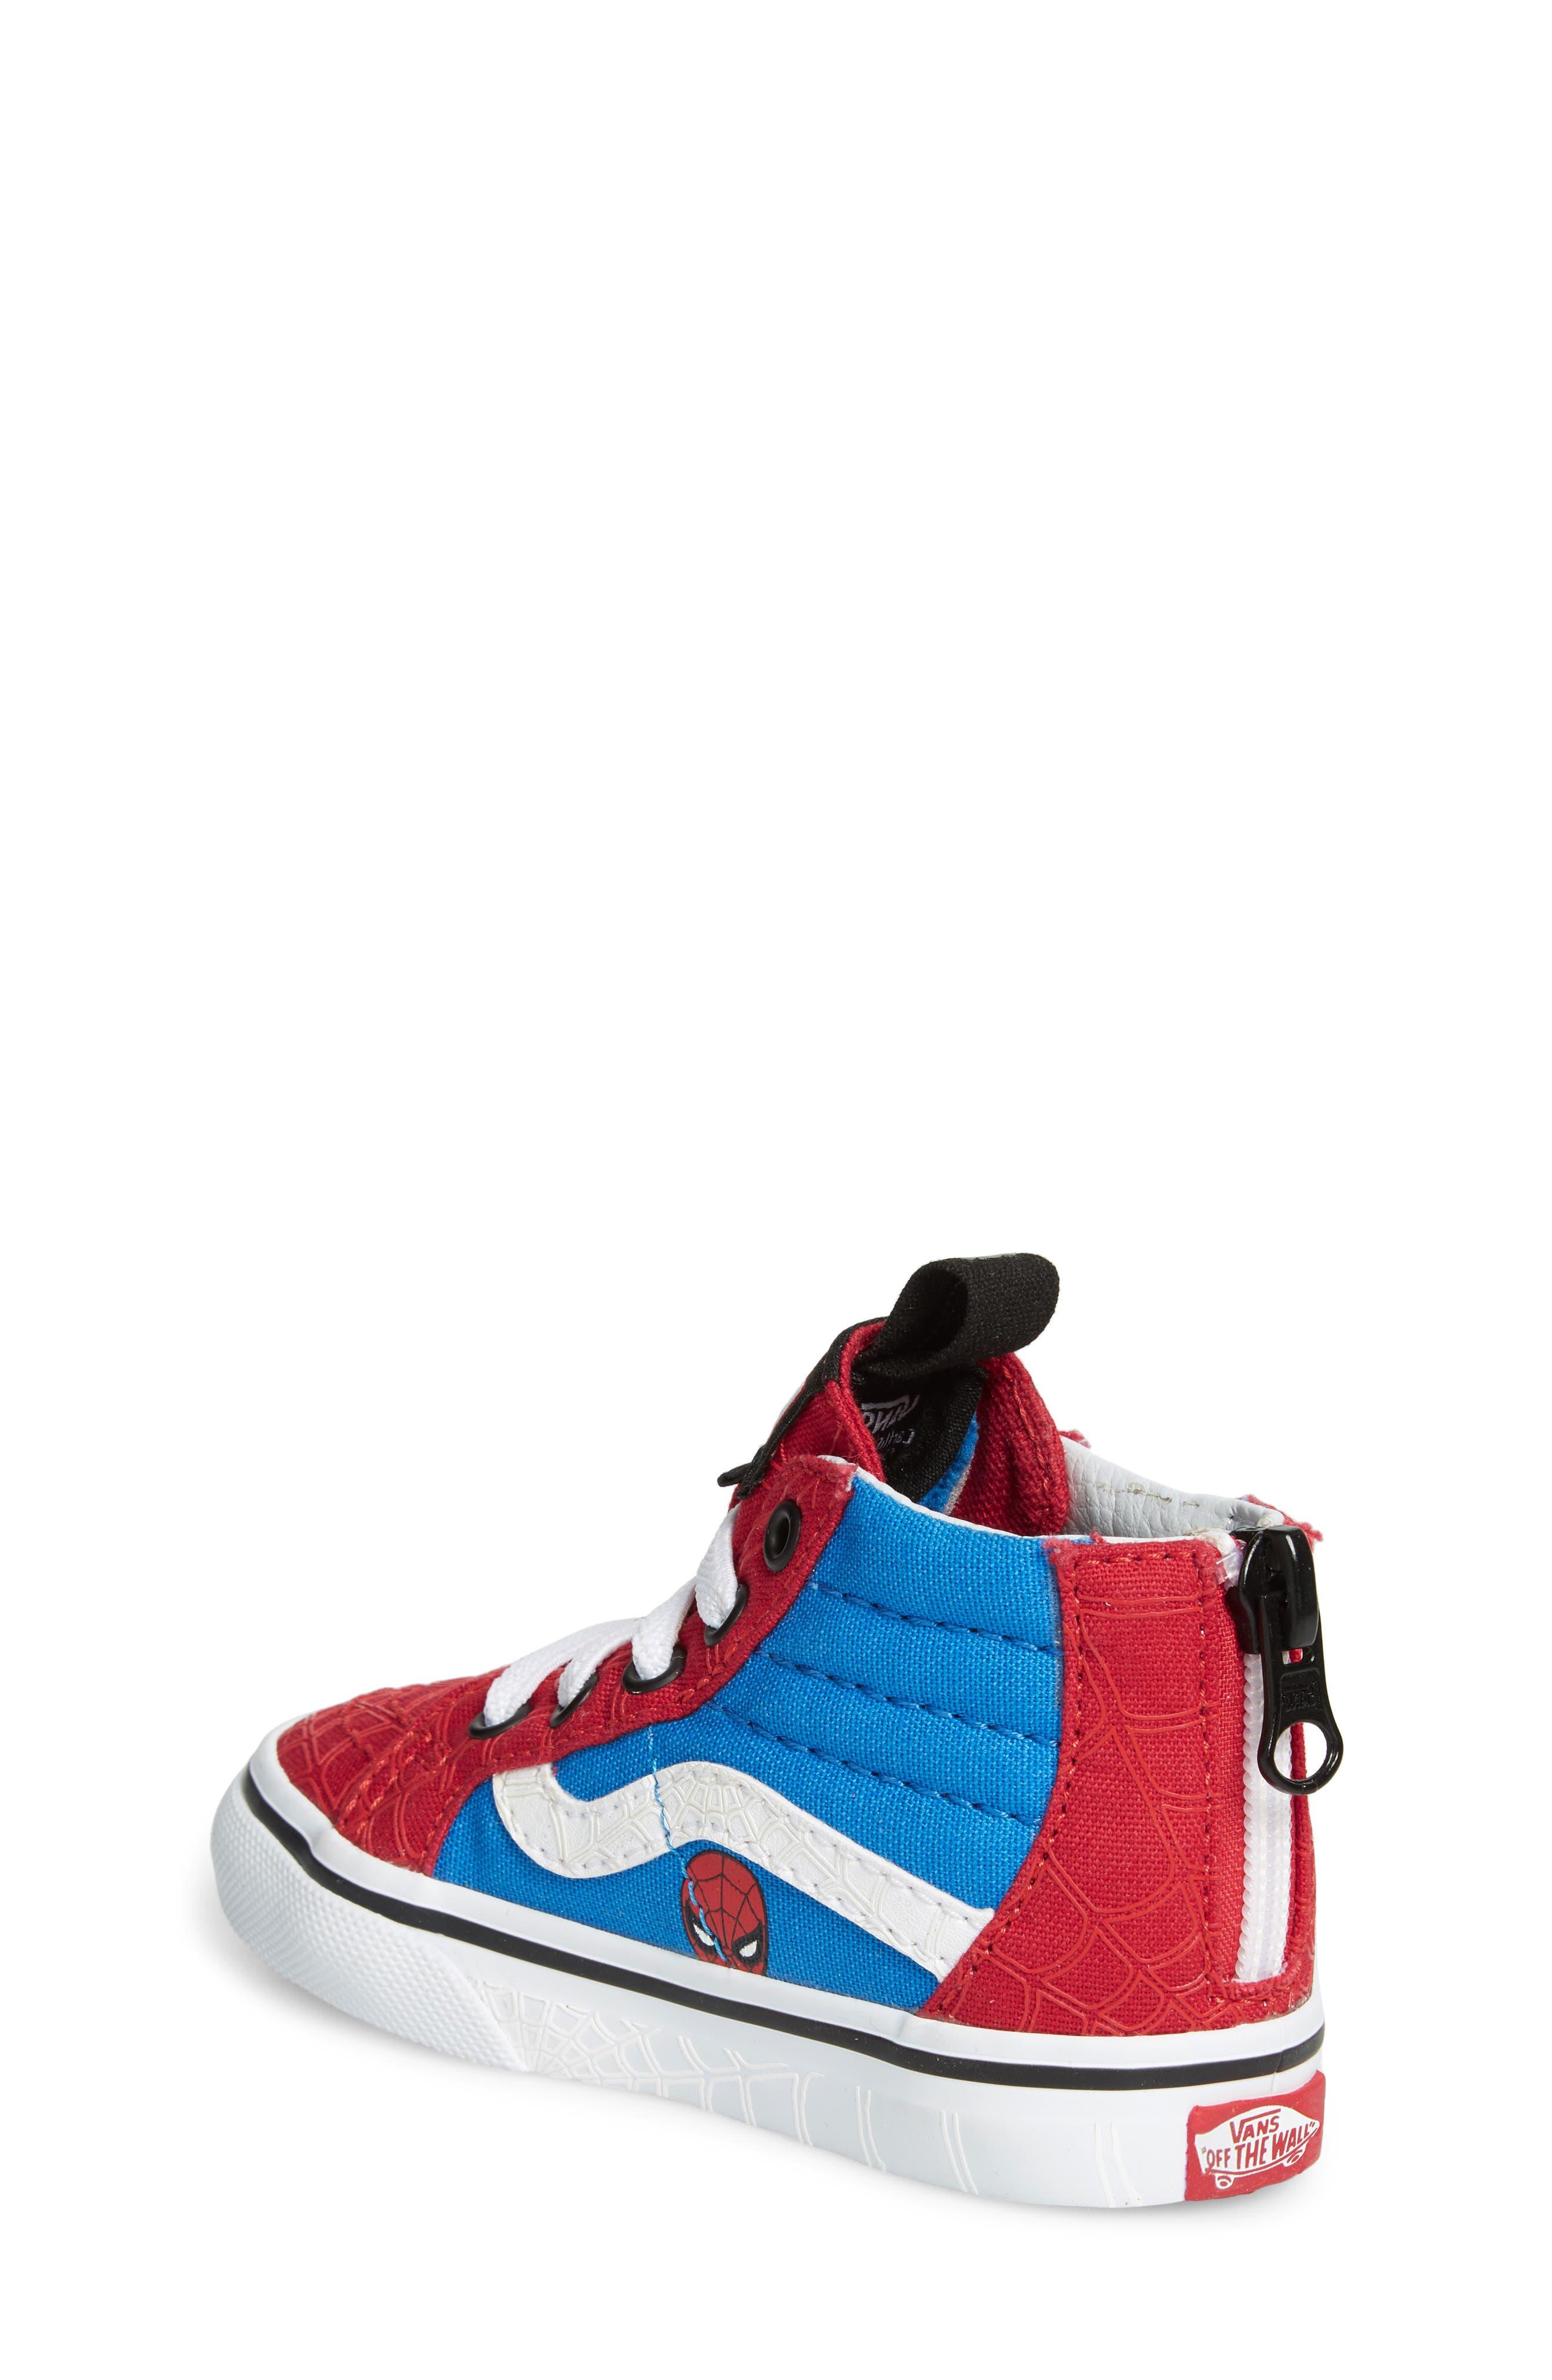 x Marvel<sup>®</sup> Spider-Man SK8-Hi Sneaker,                             Alternate thumbnail 2, color,                             610